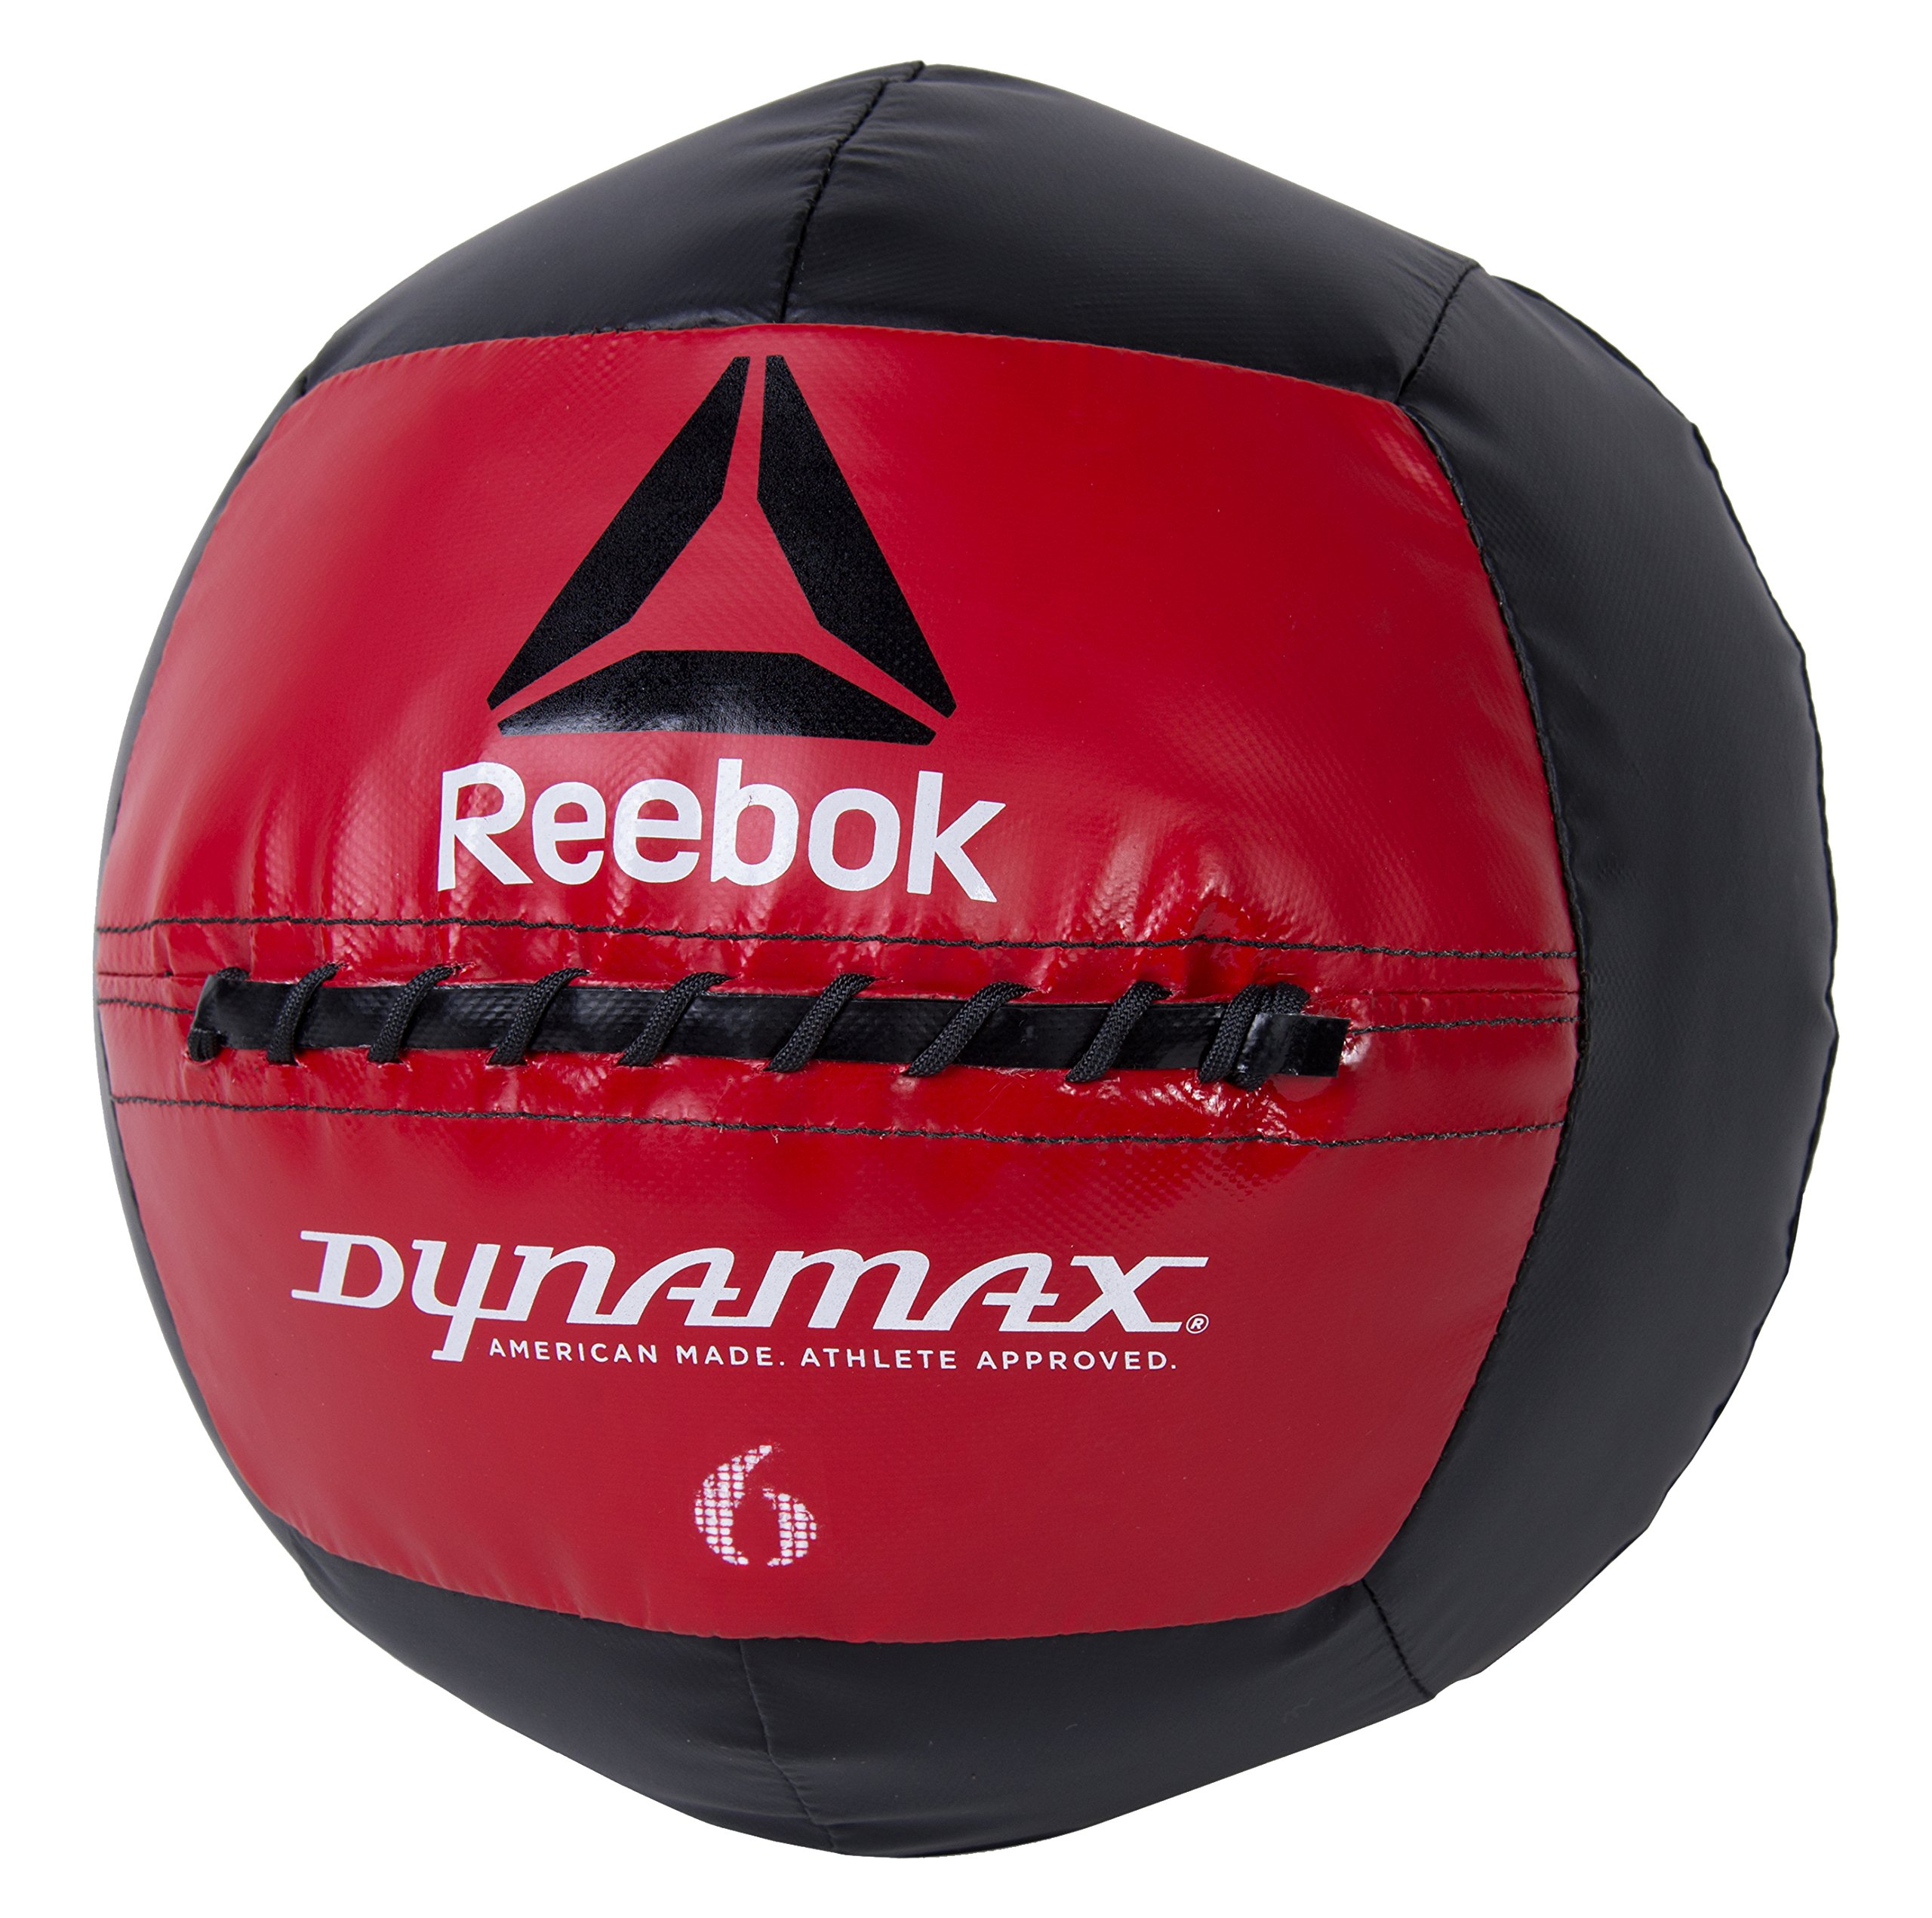 Reebok Soft-Shell Medicine Ball by Dynamax, 6 lbs